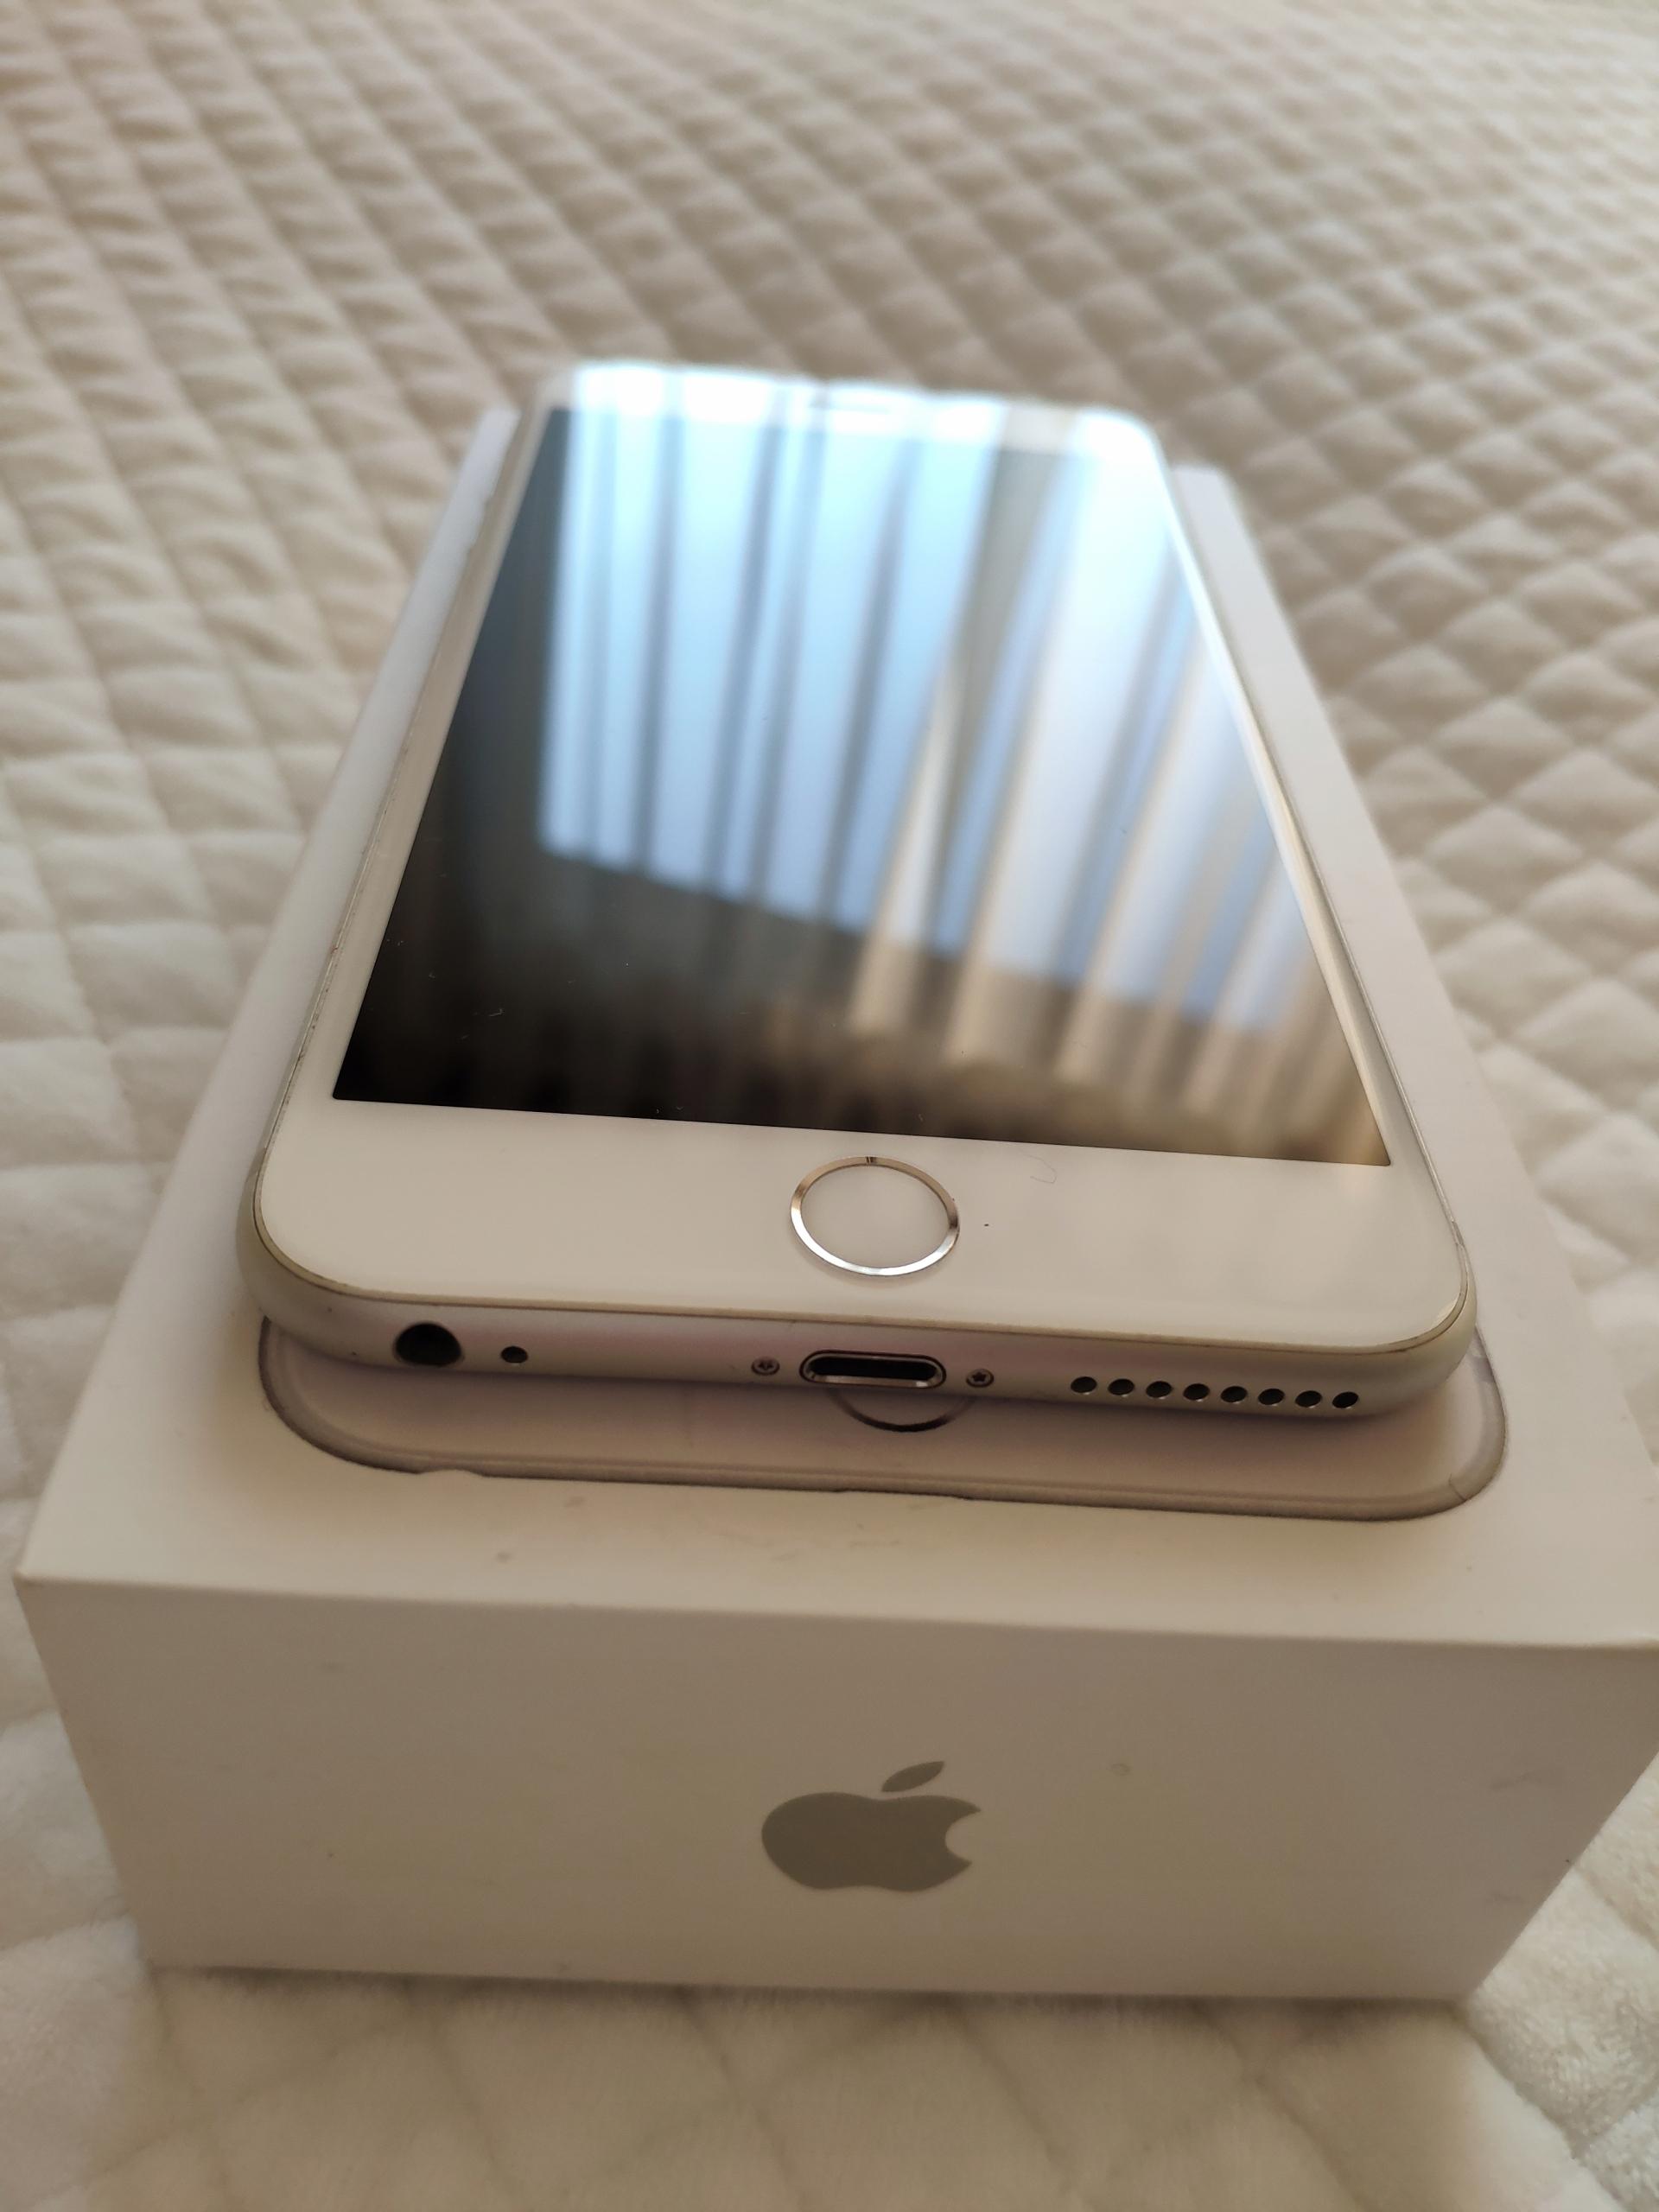 Smartfon Apple iPhone 6S Plus srebrny 64 GB